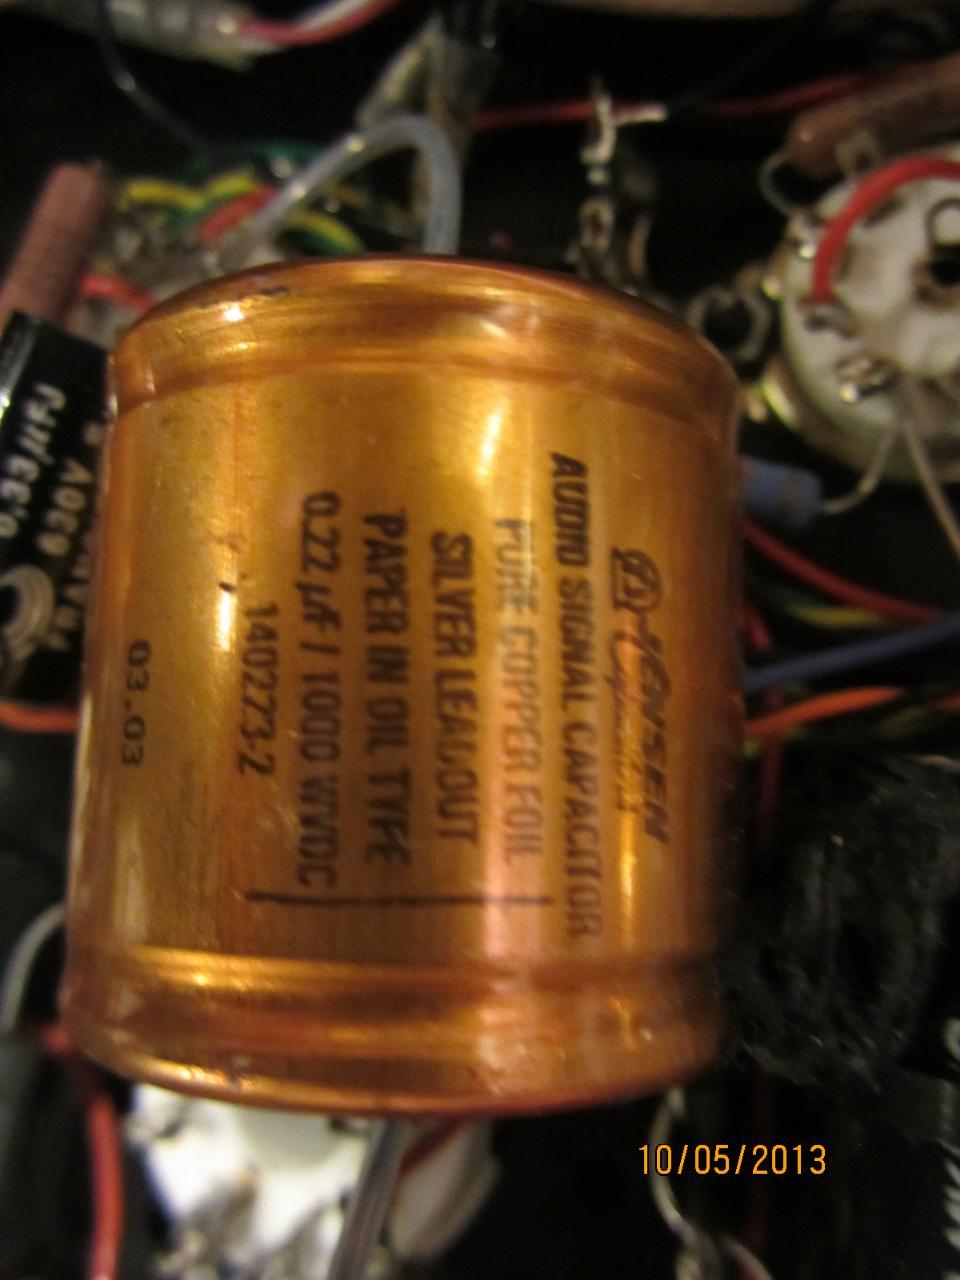 Jensen Capacitor upgrades